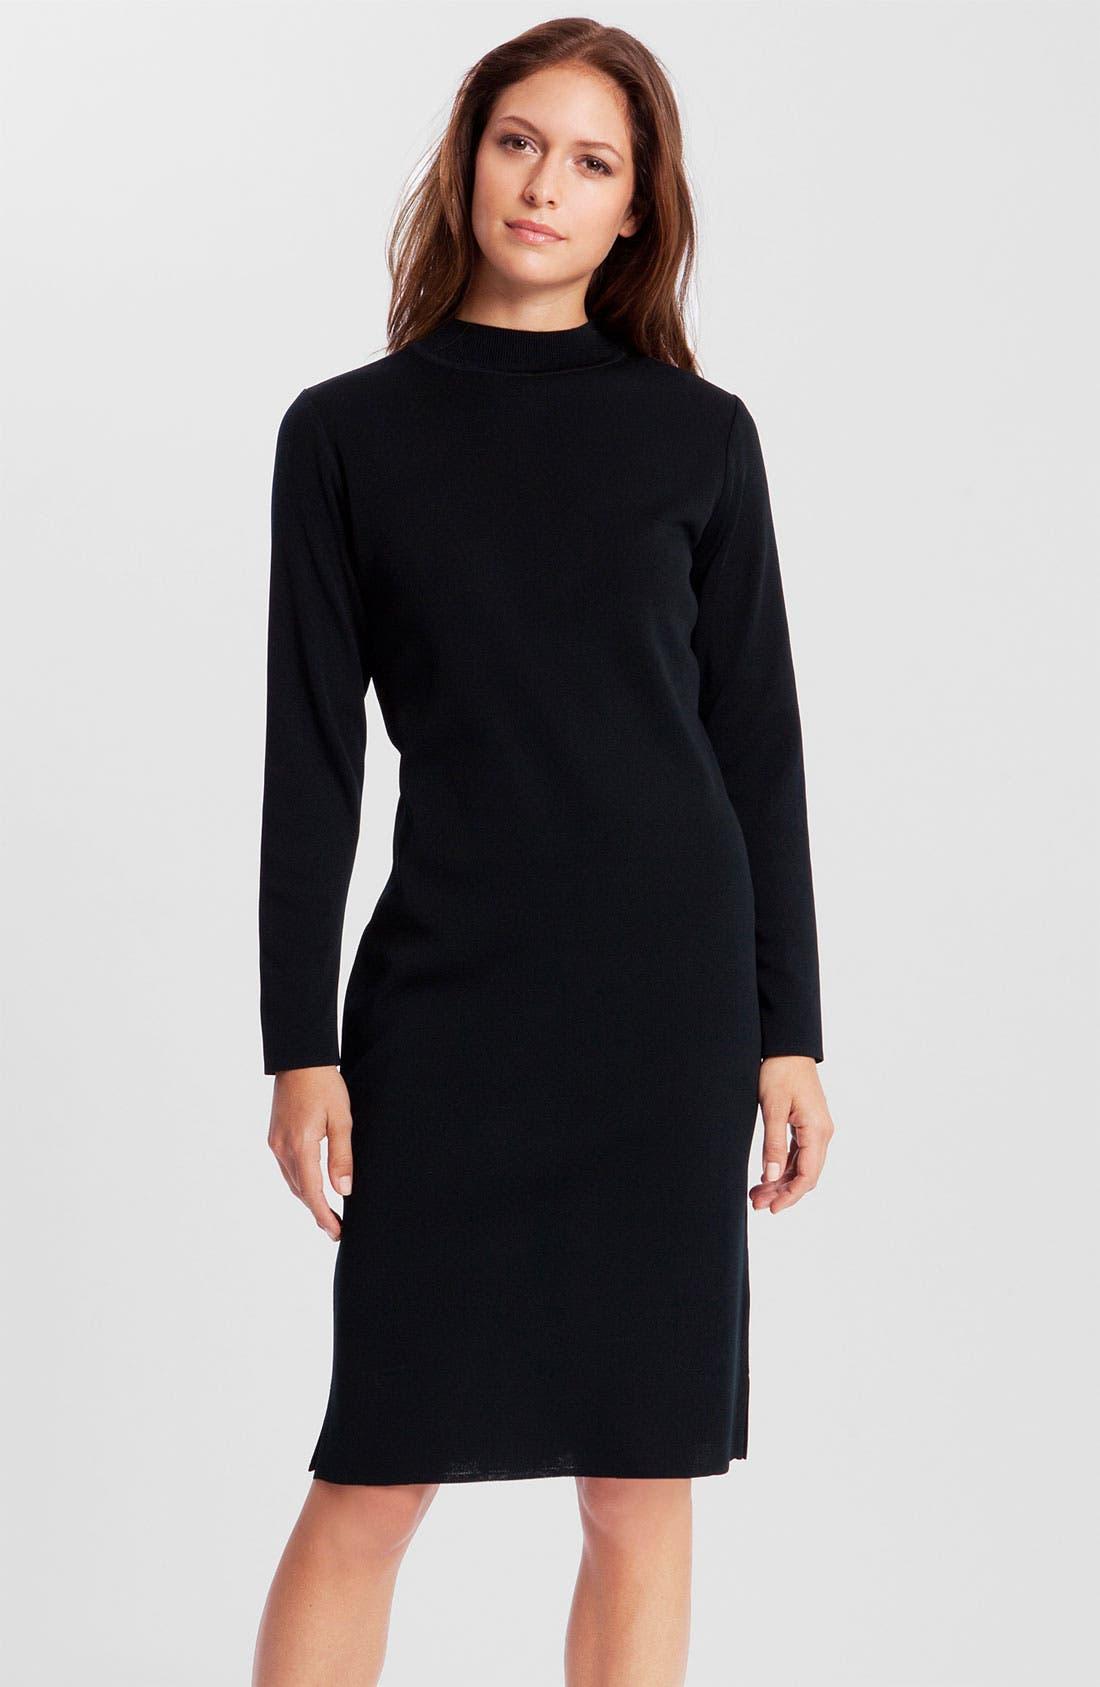 Alternate Image 1 Selected - Ming Wang Mock Neck Dress